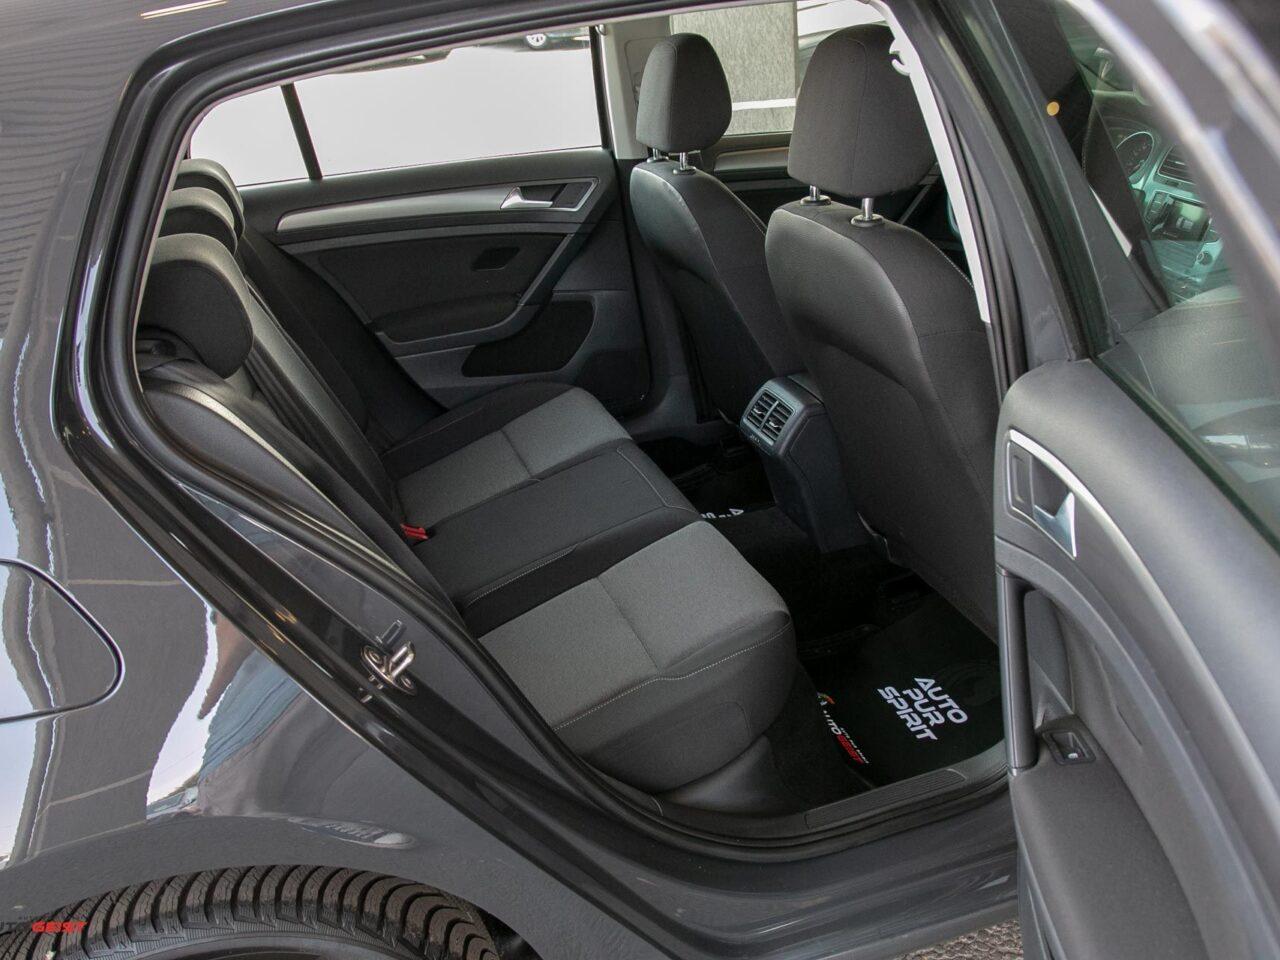 VW-golf-7-scurt-2016-3315